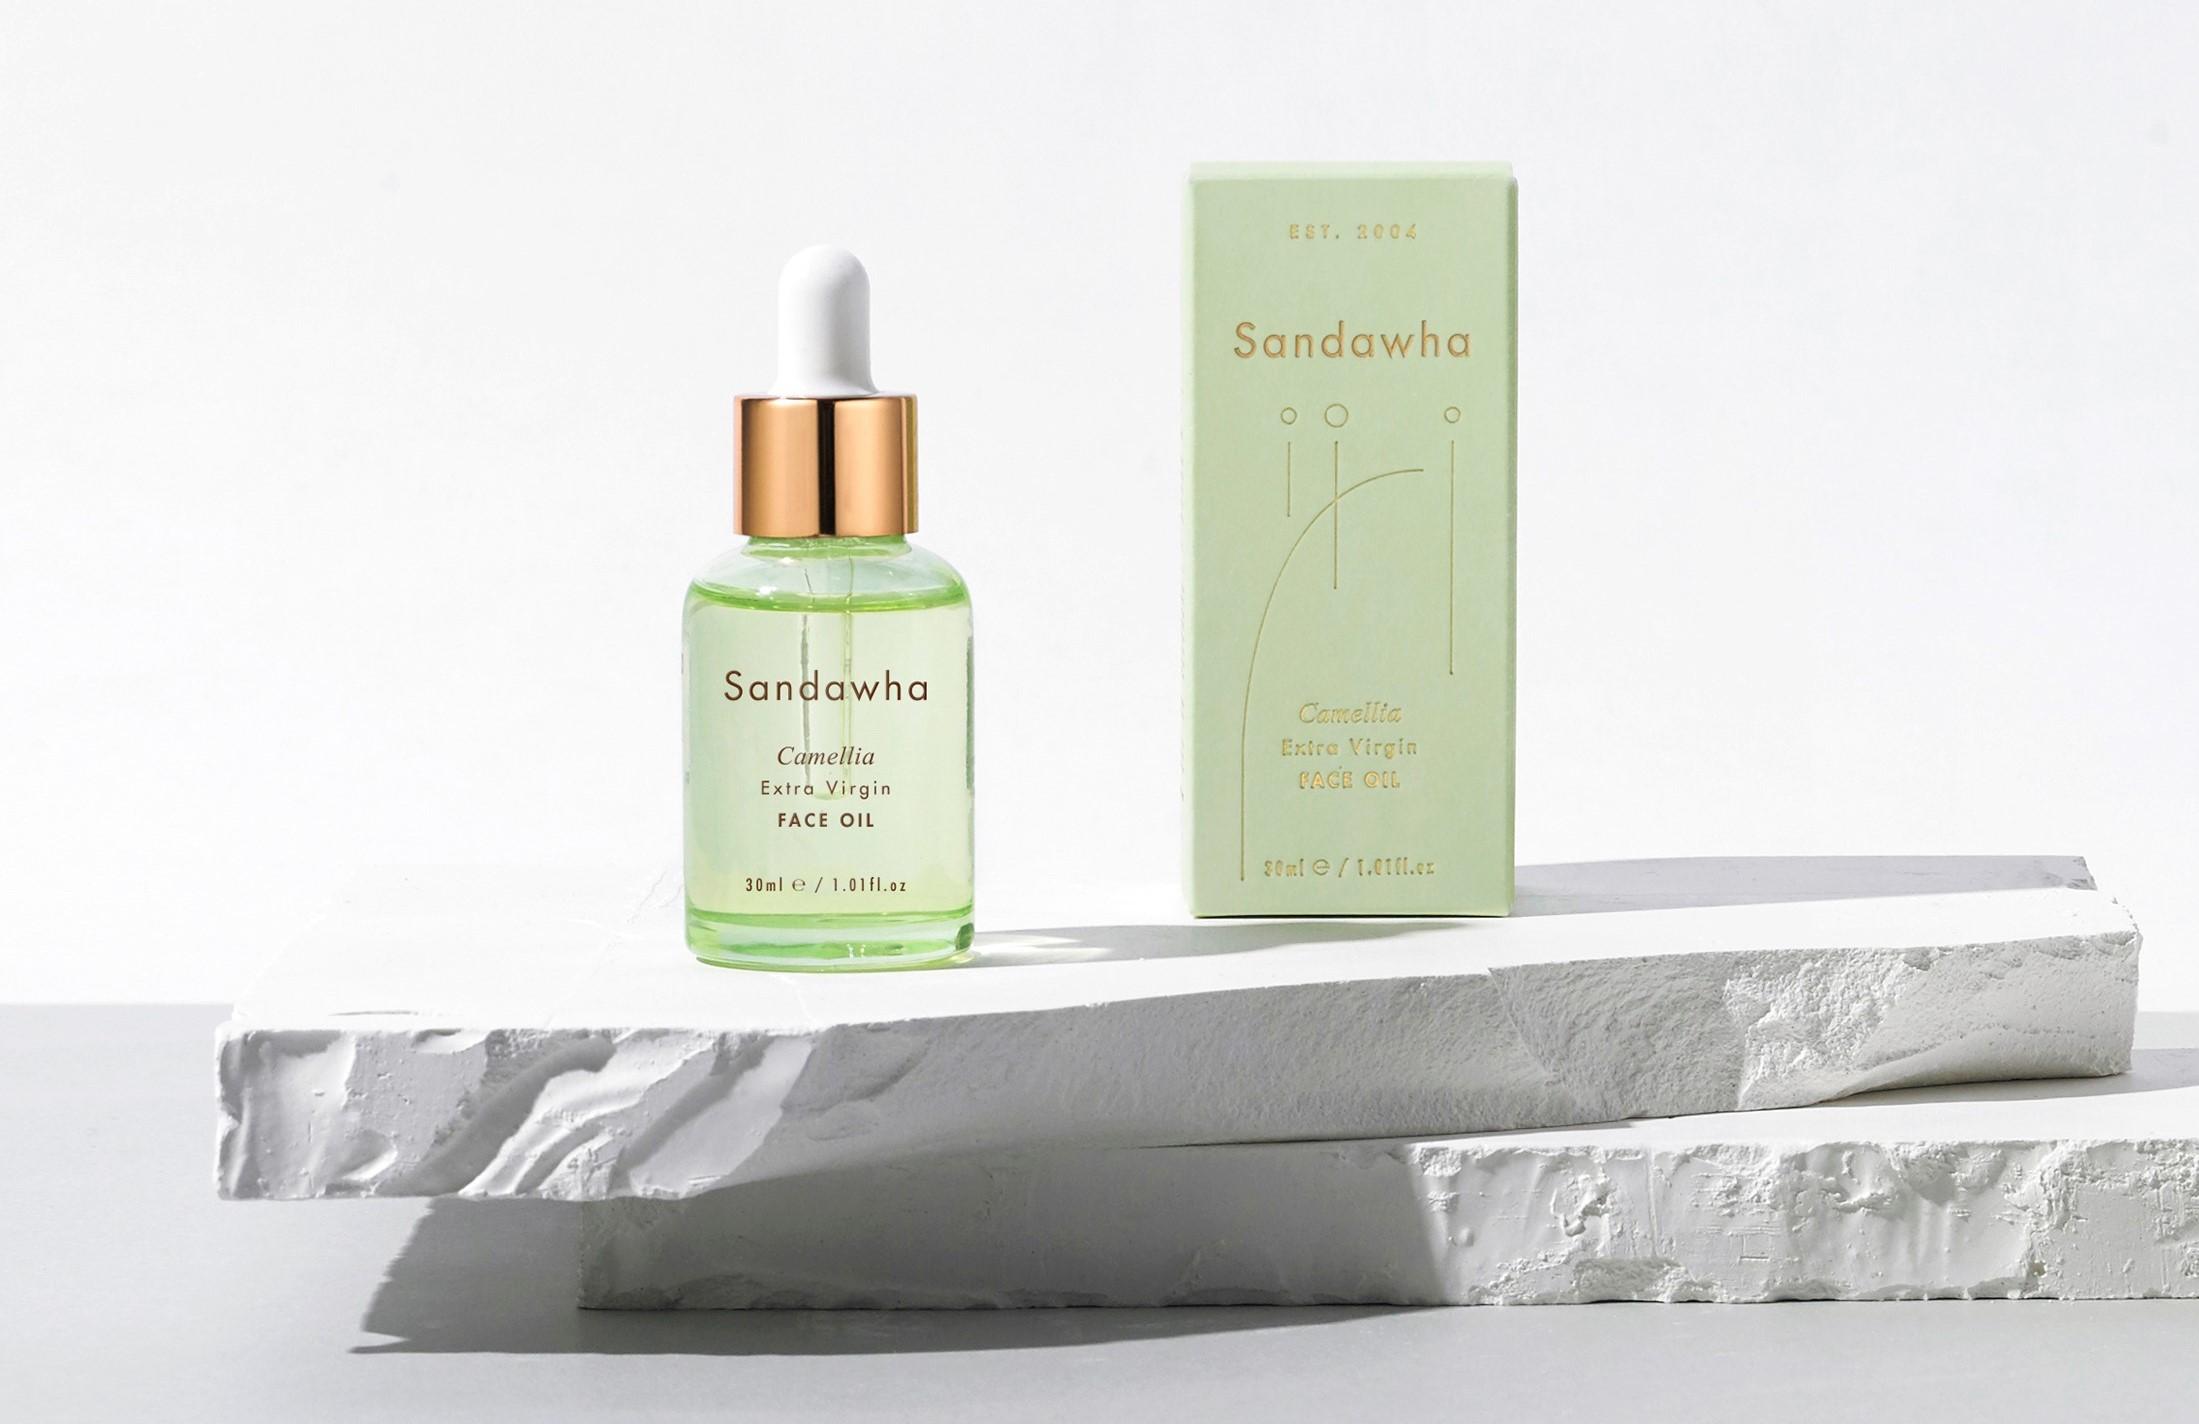 Sandawha Camellia extra-virgin face oil